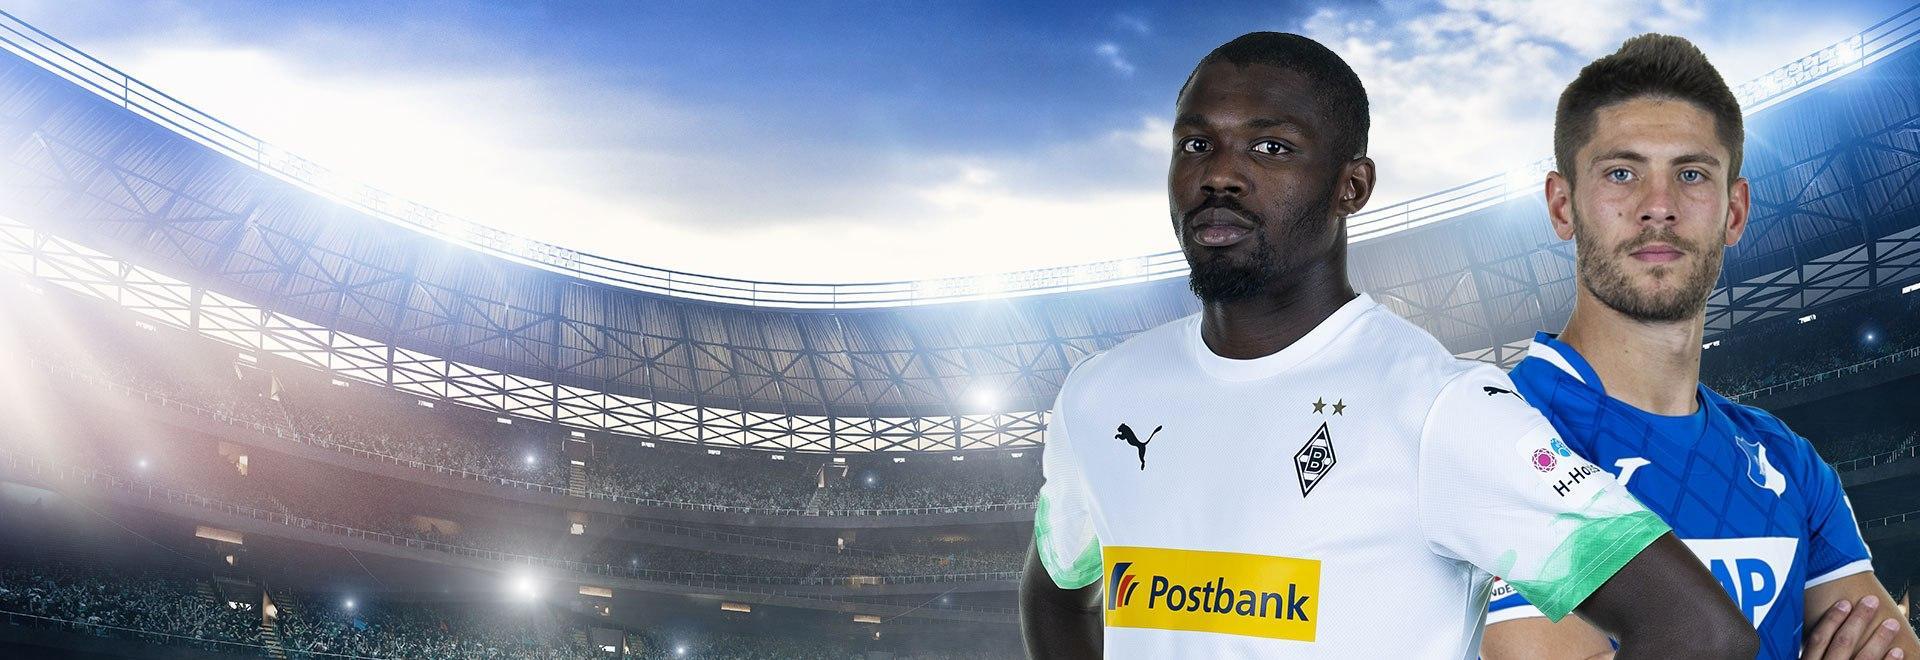 Borussia M. - Hoffenheim. 23a g.